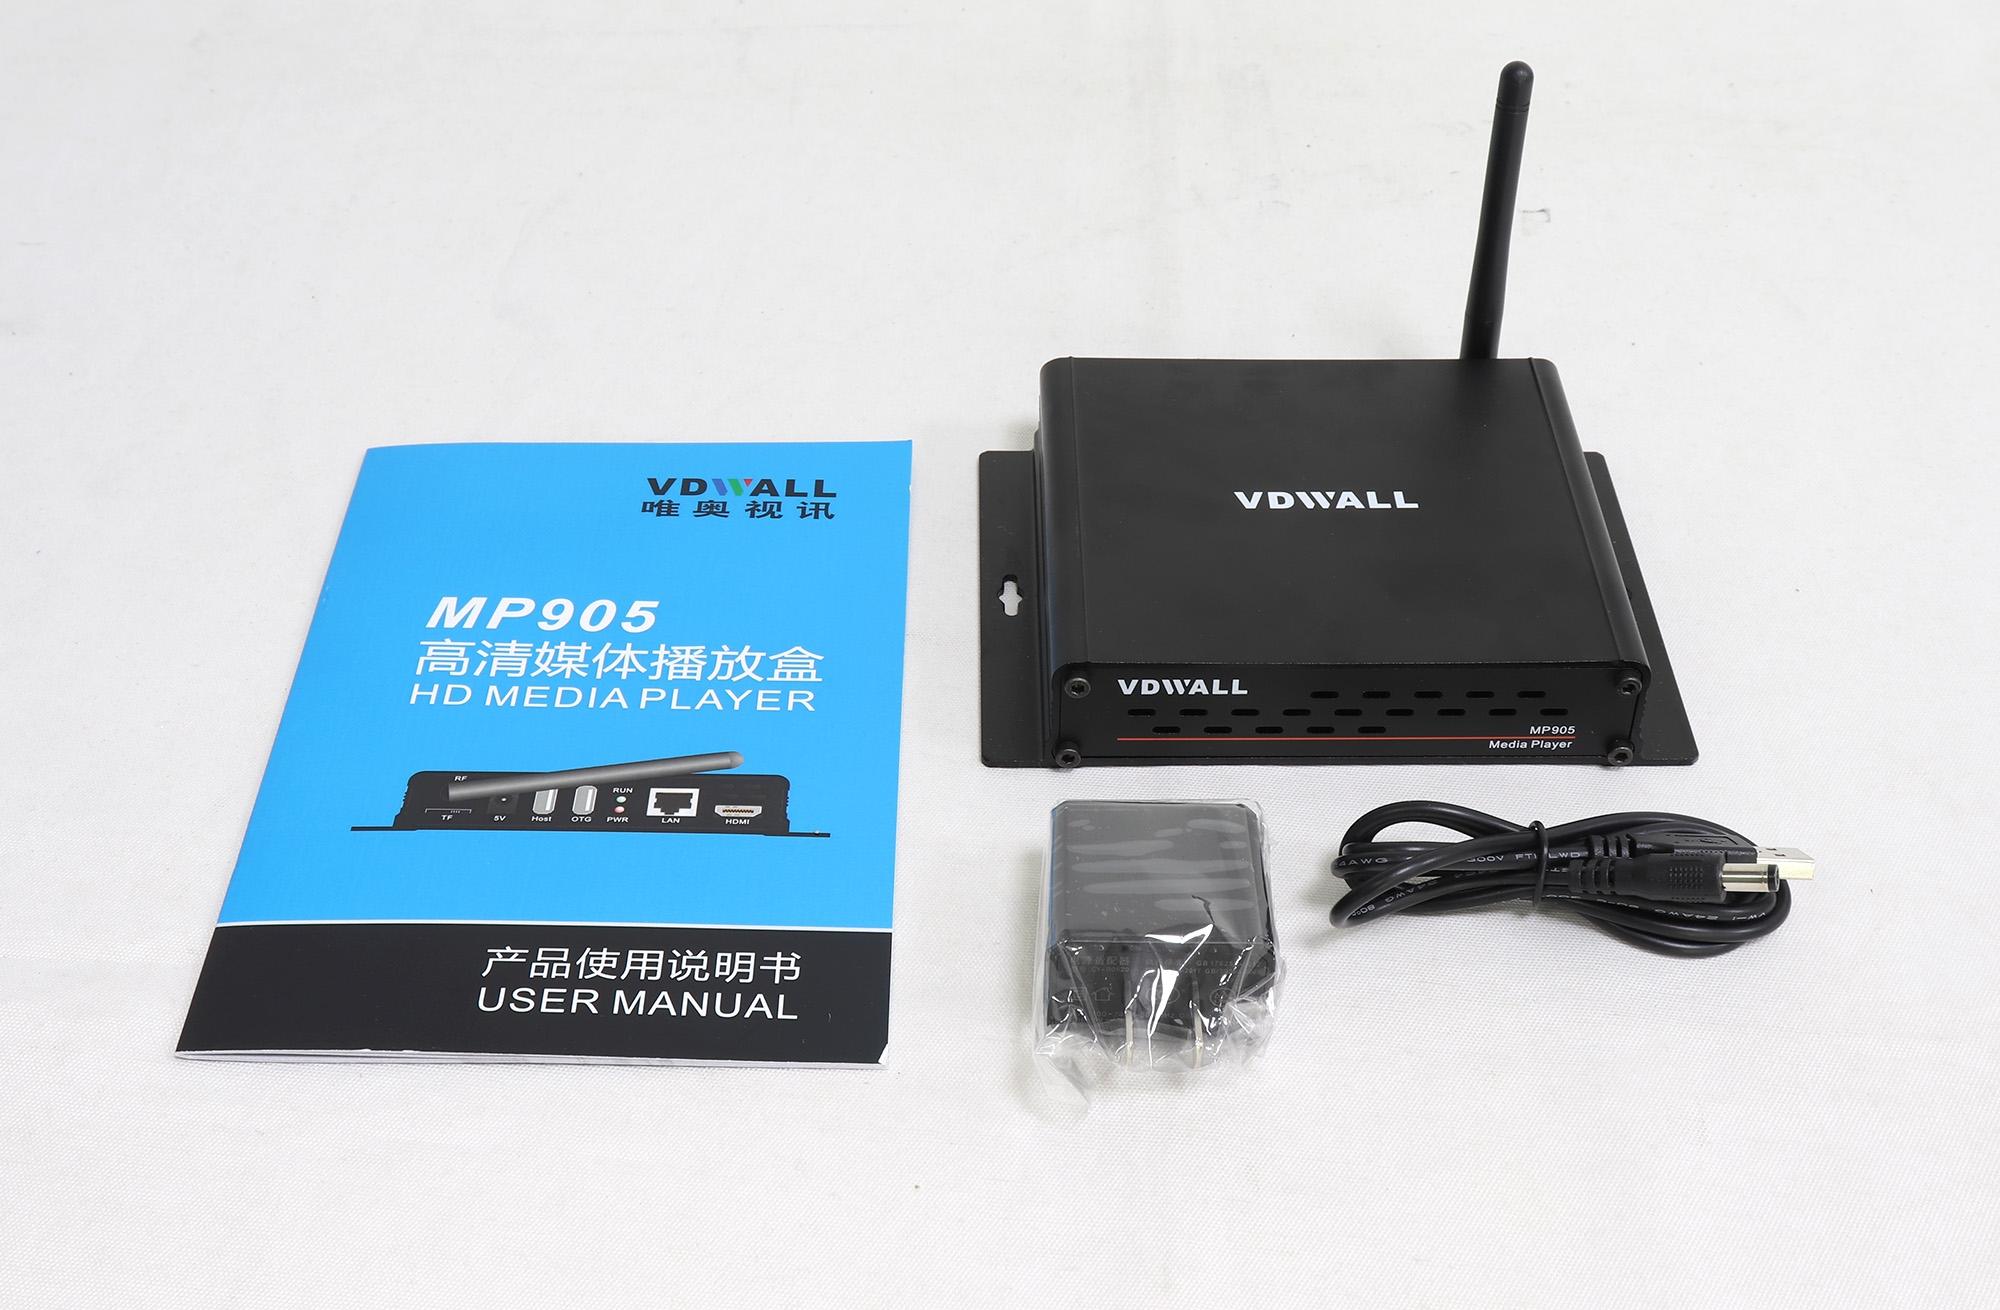 VDWall MP905 4K Ultra HD LED Display Media Player